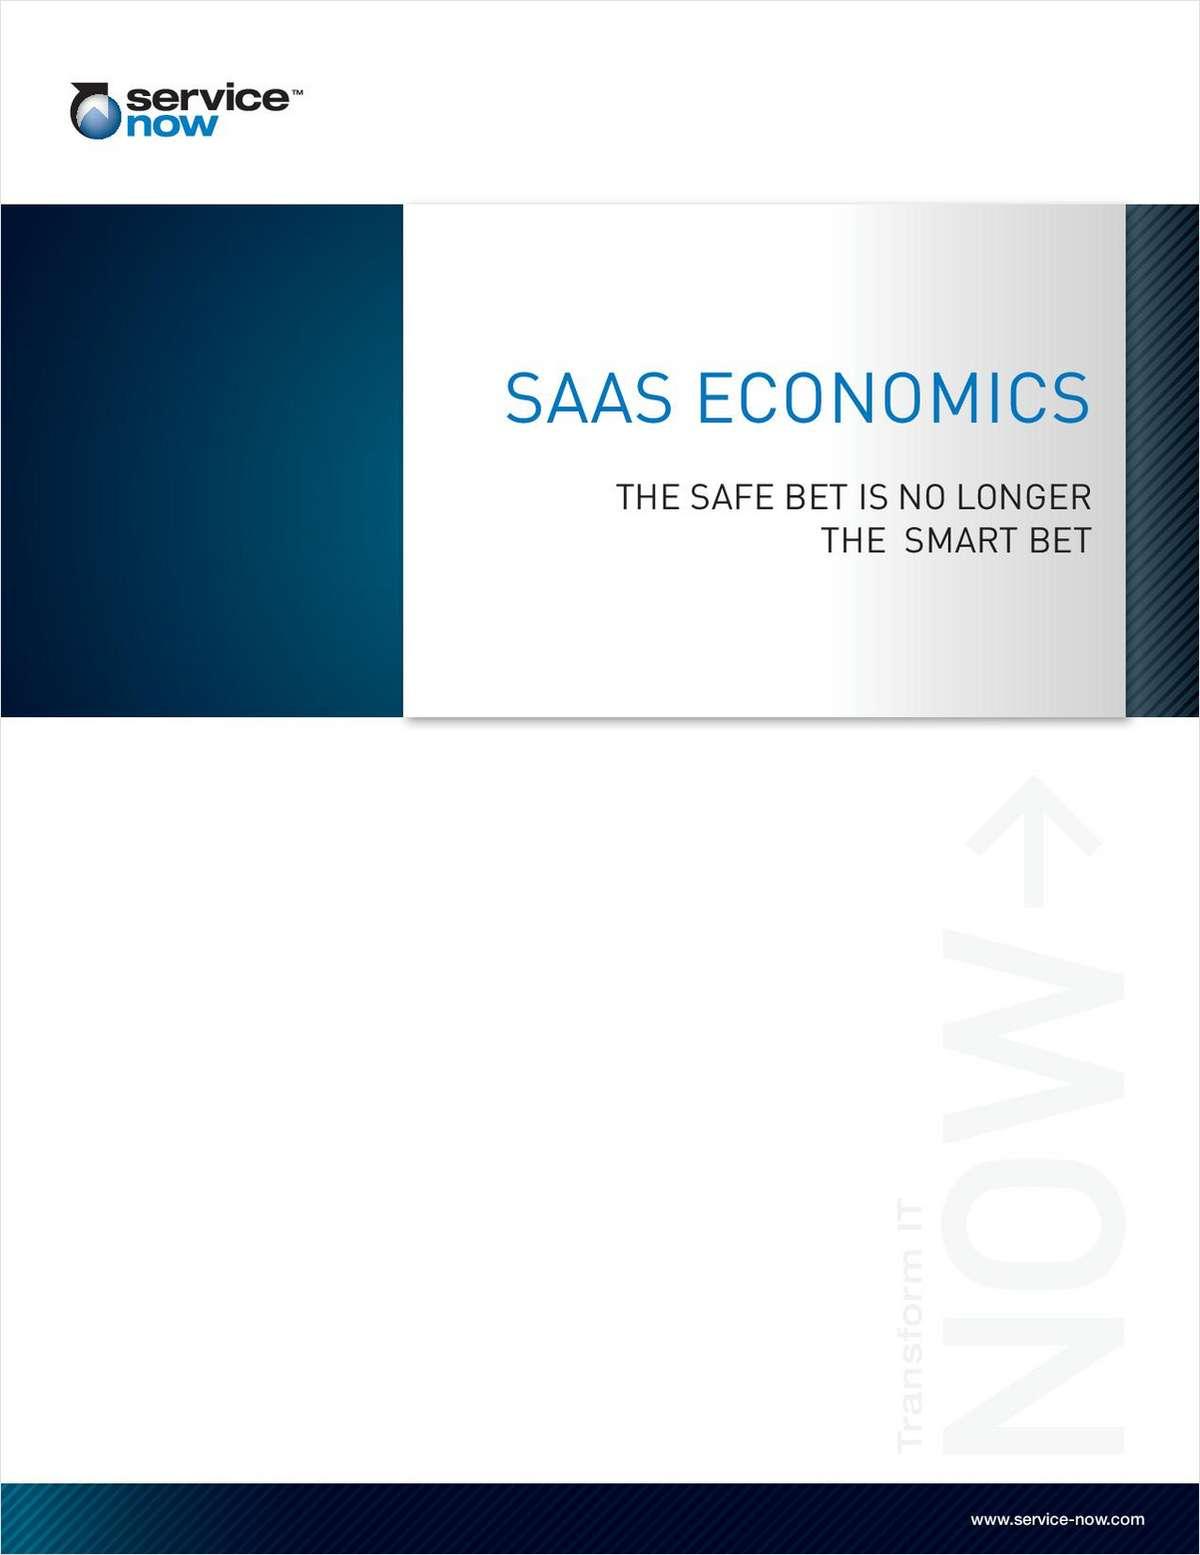 SaaS Economics: The Safe Bet is No Longer the Smart Bet